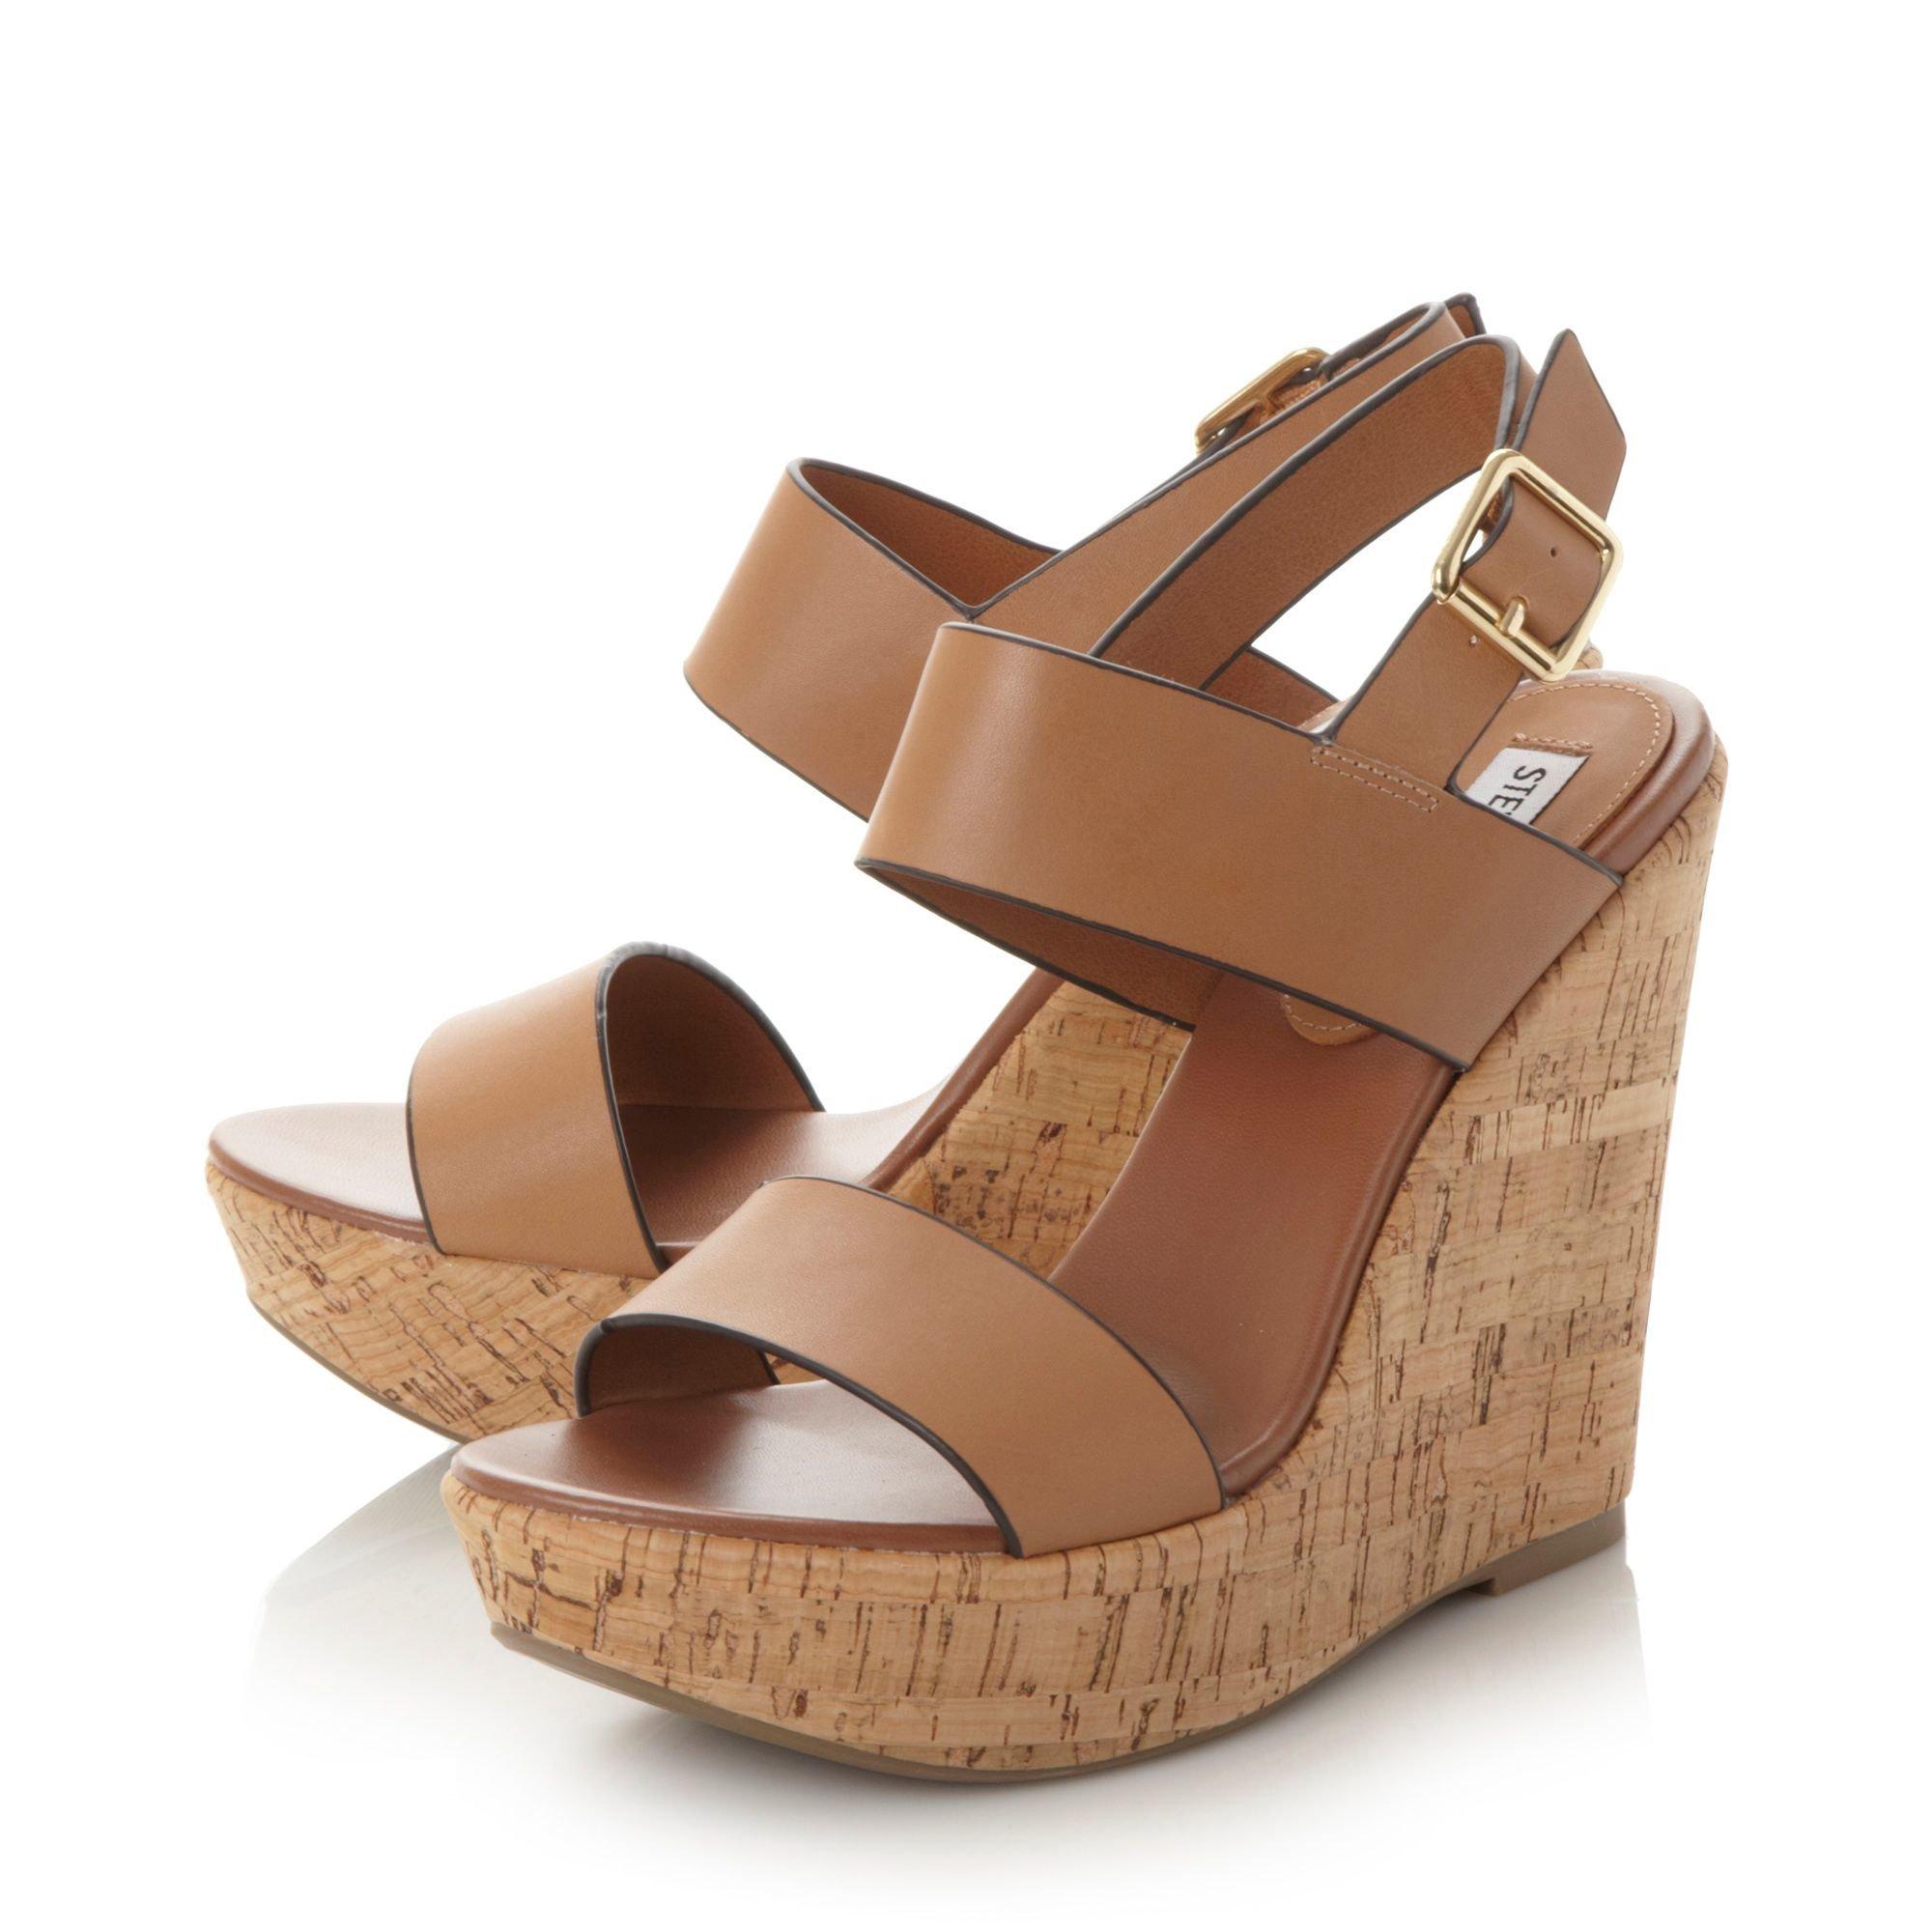 Steve madden Esme Cork Wedge Sandals in Brown | Lyst